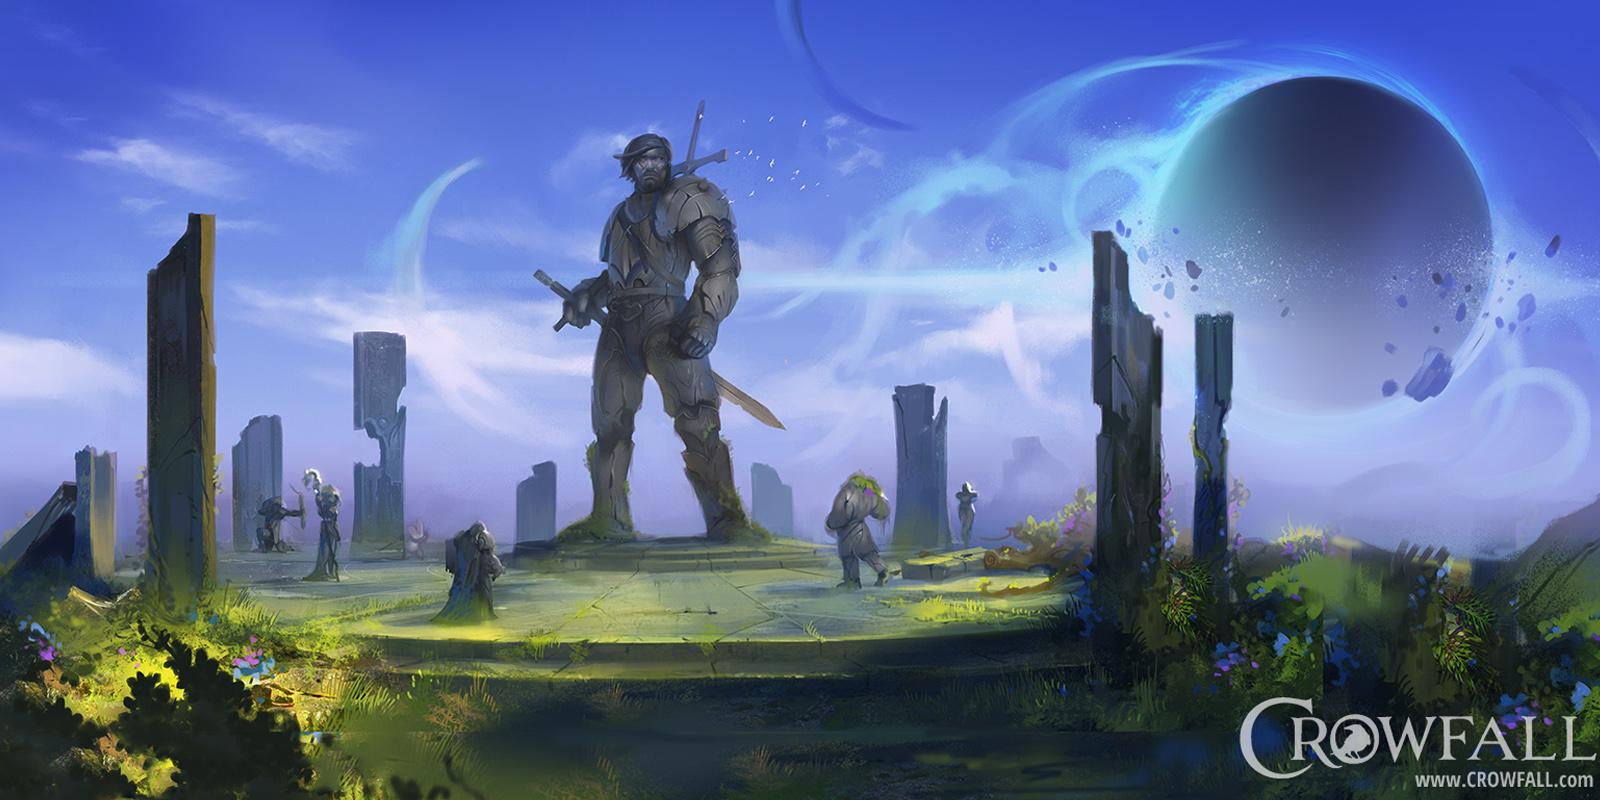 MMO-индустрия: Crowfall расширяет VIP-статус, Амазон запускает